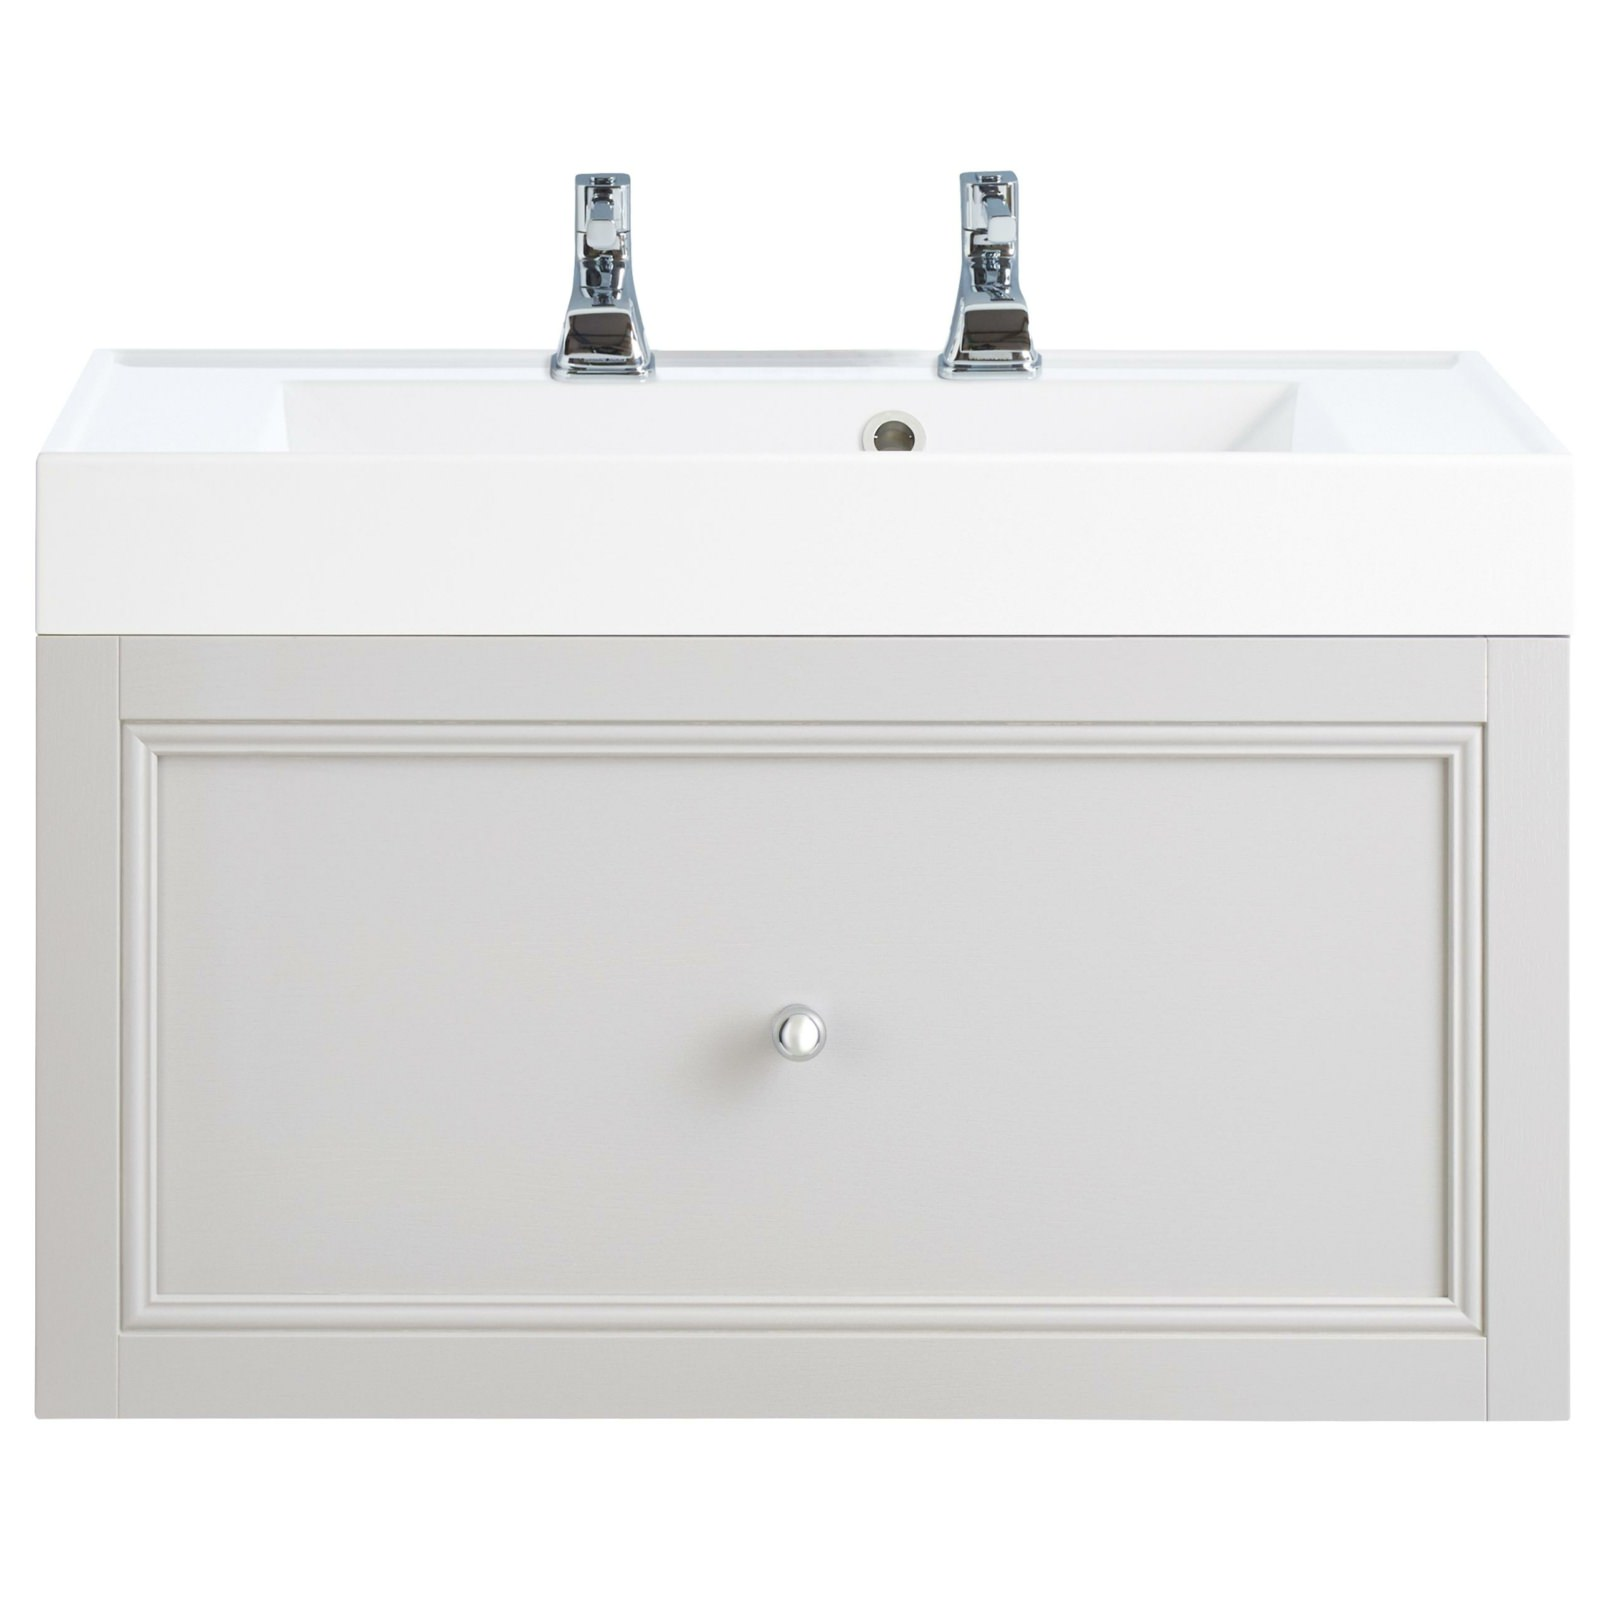 Heritage Bathroom Vanity: Heritage Caversham White Ash 700mm 1 Drawer Wall Hung